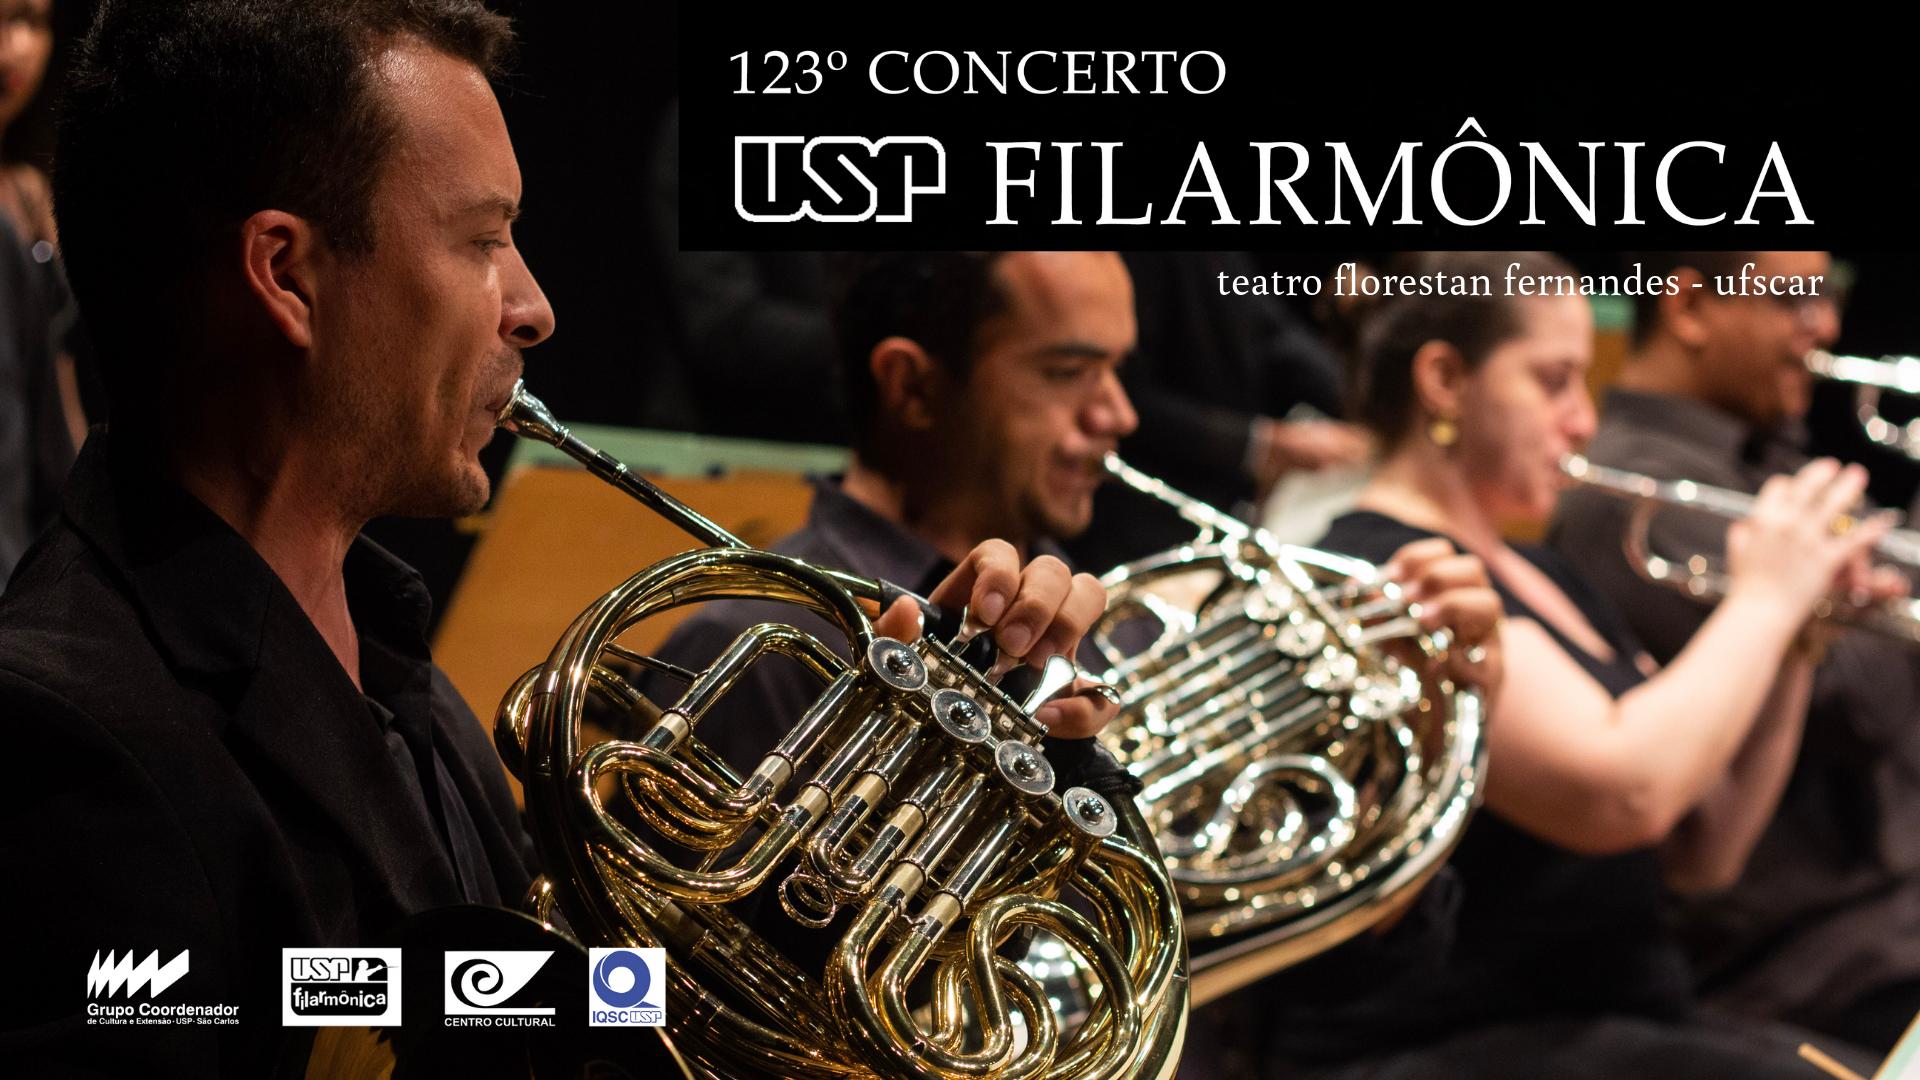 123º Concerto da USP-Filarmônica